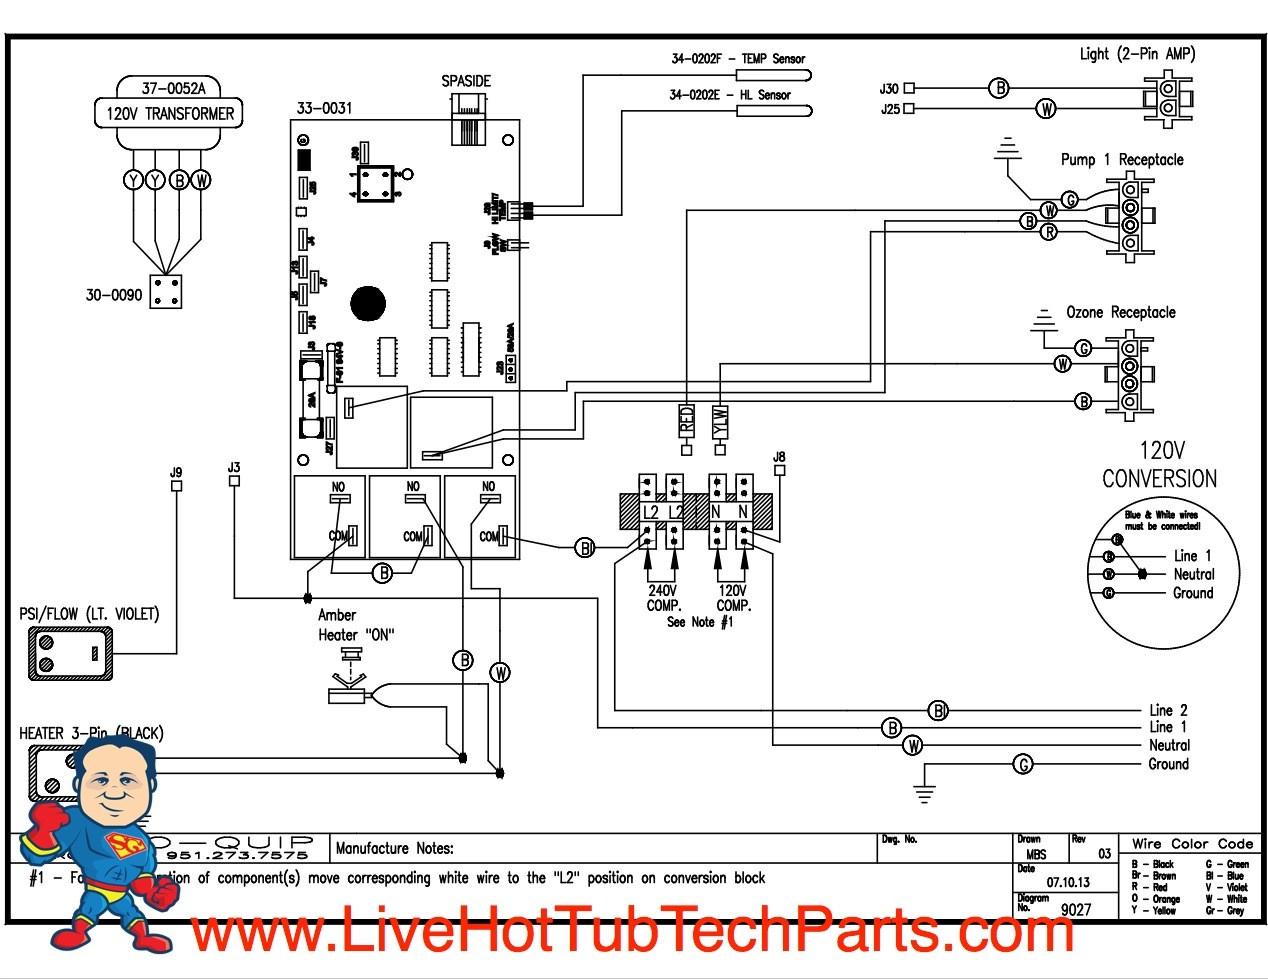 Control Hydro Quip Silver B 115v 230v 4 0kw Slide W Topside